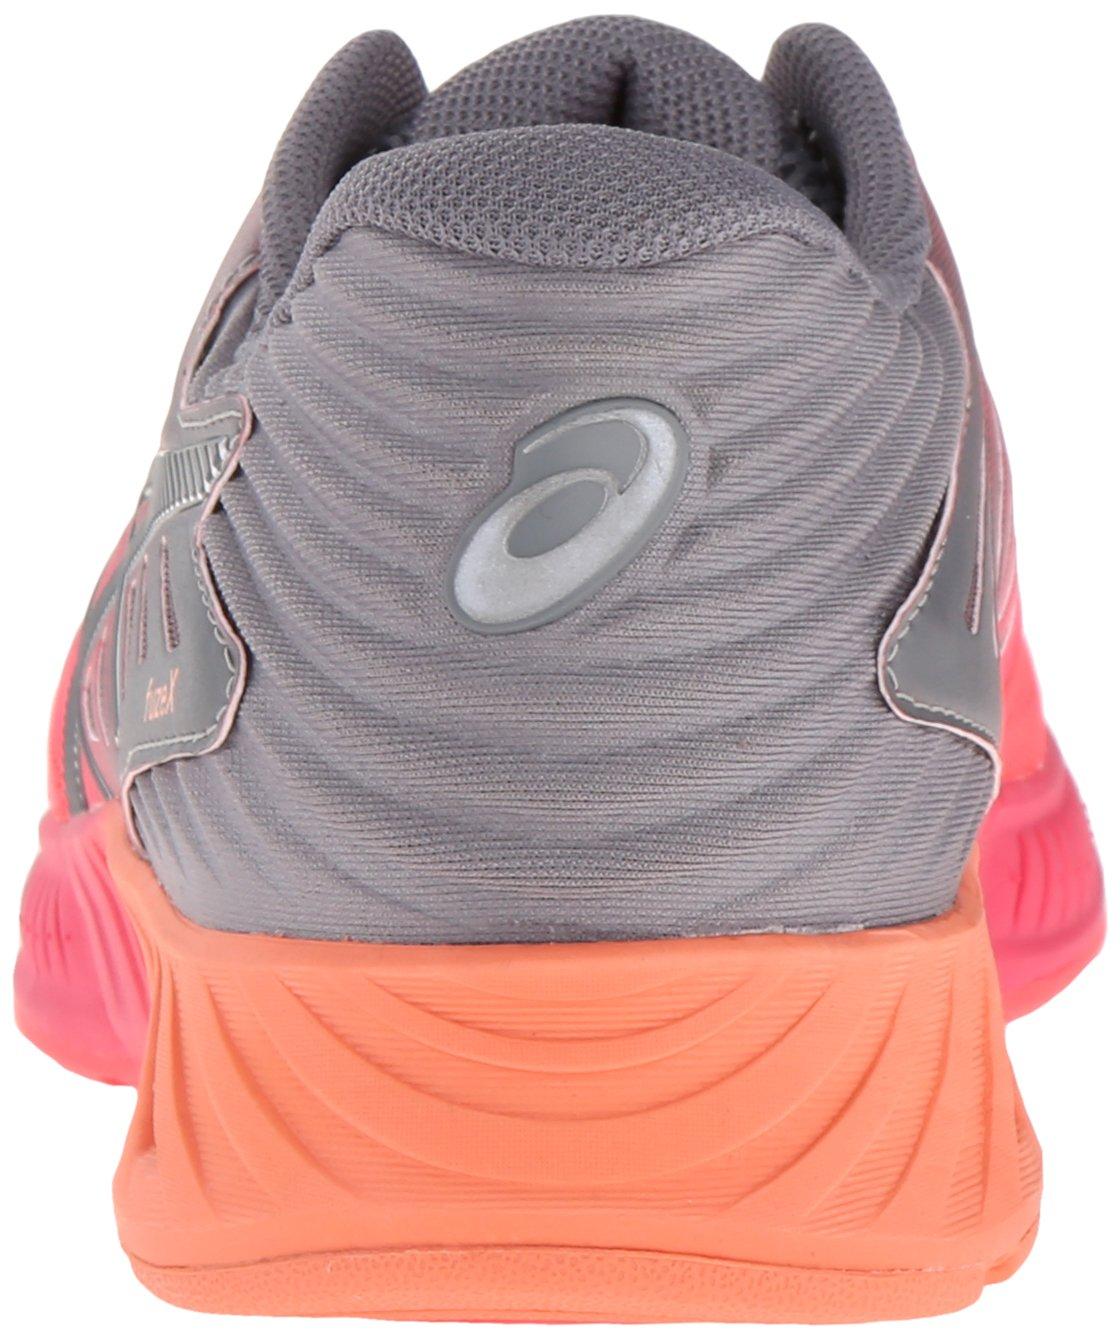 ASICS Women's fuzeX Running Shoe B00YB0NLJ2 10 B(M) US|Diva Pink/White/Carbon